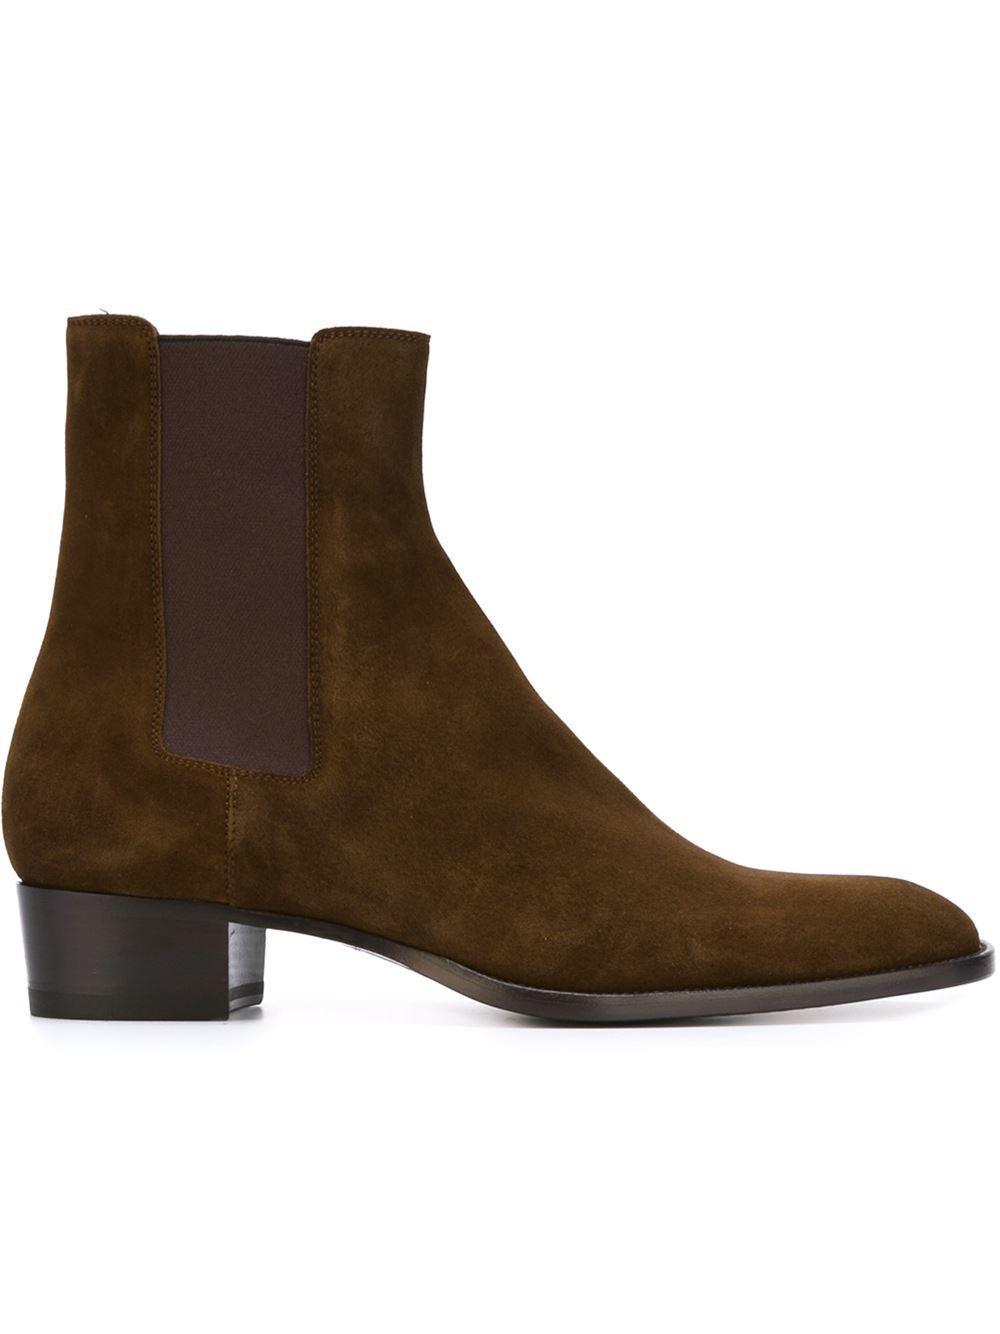 Saint Laurent Wyatt Ankle Boots In Brown For Men Lyst